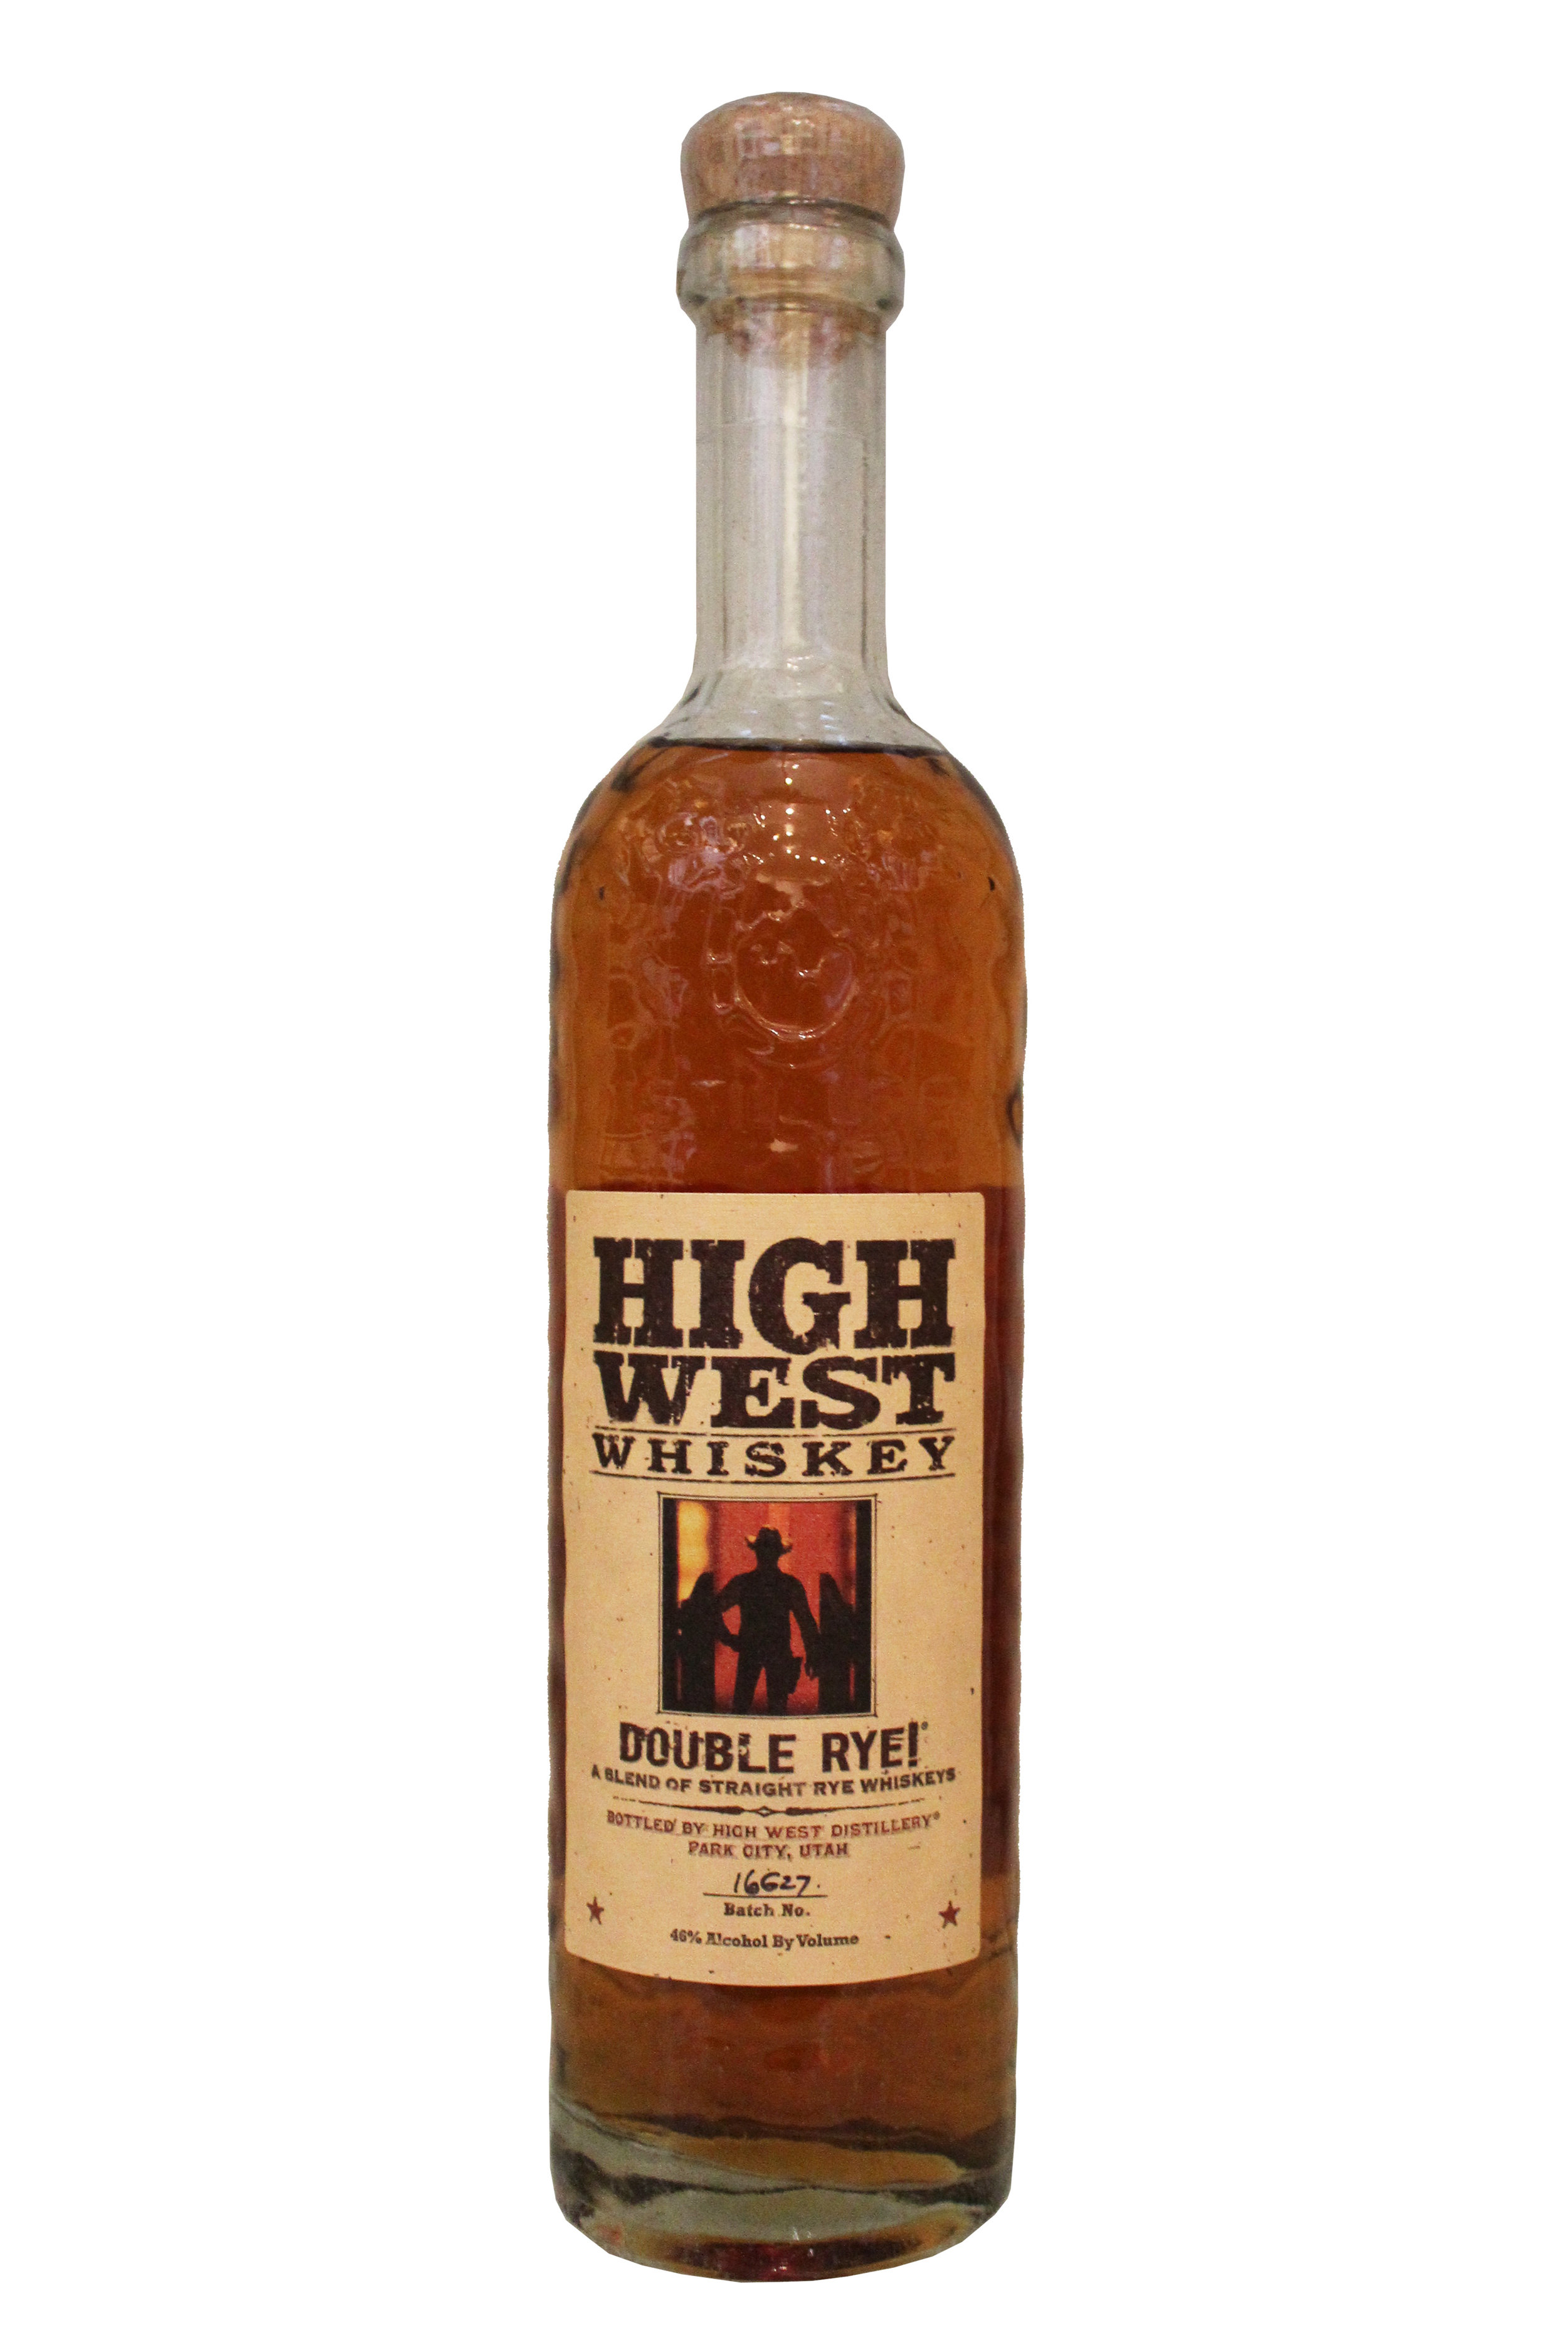 Double Rye Whiskey  High West Whiskey, Utah